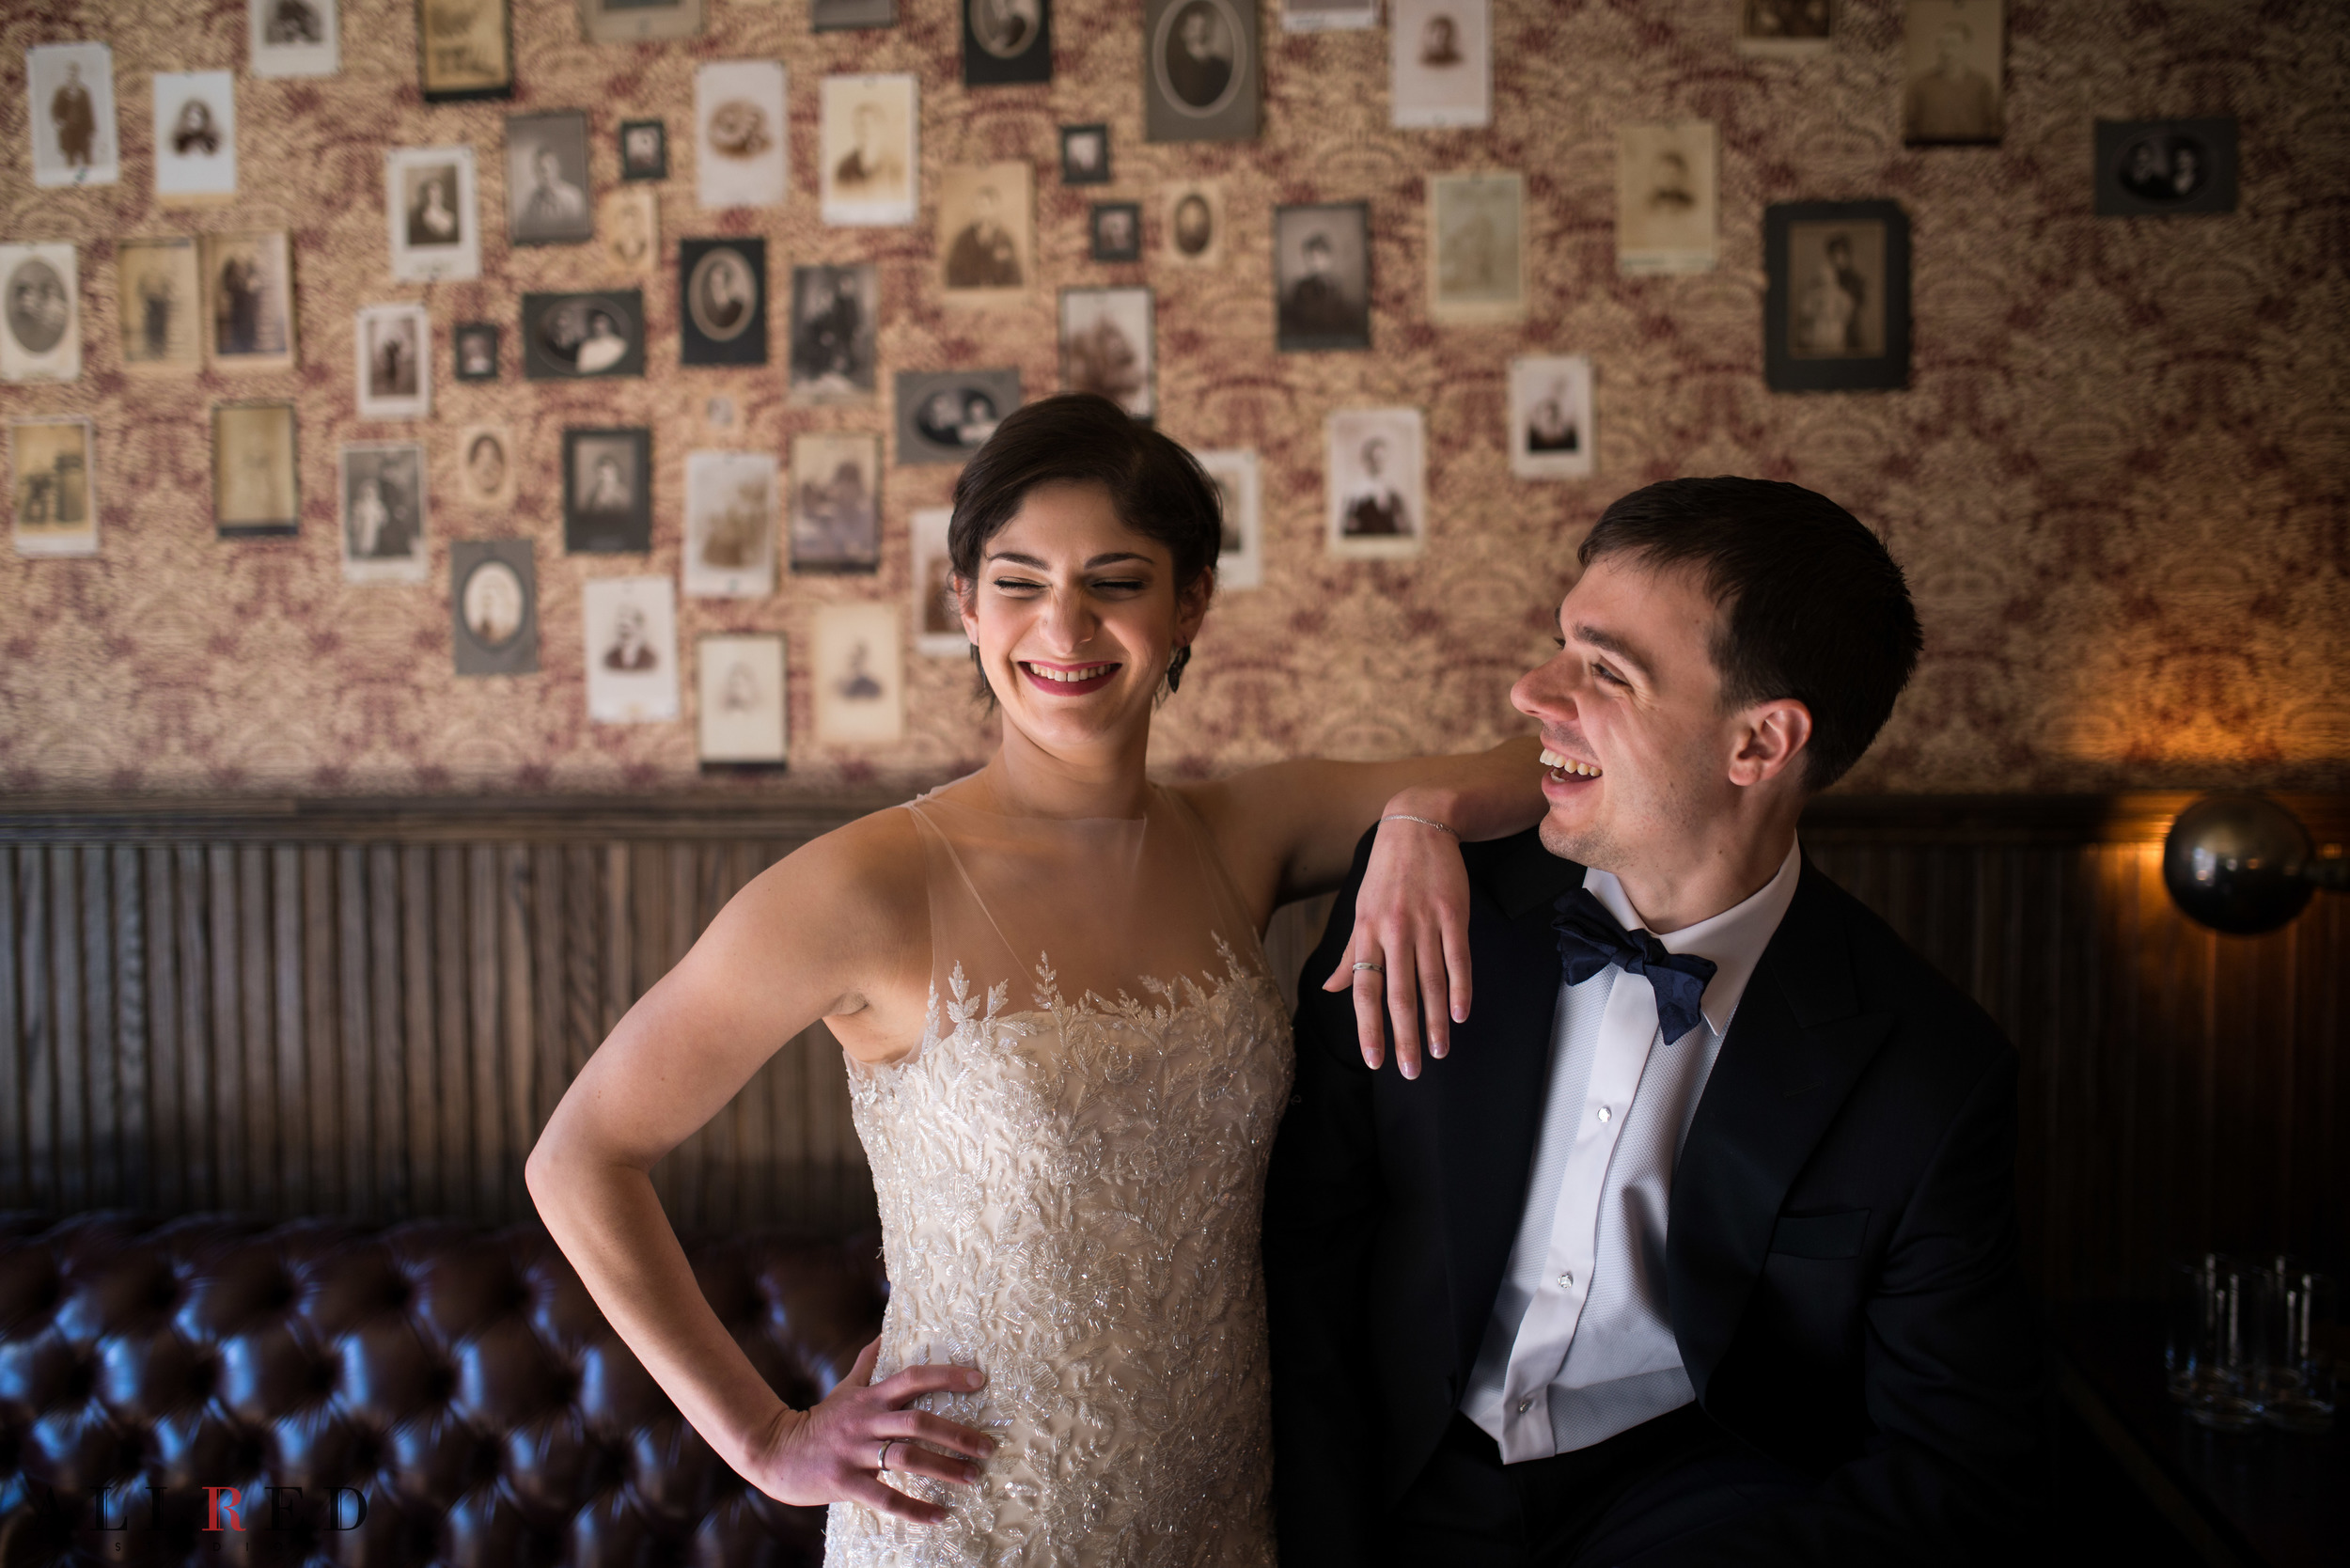 Wedding-Brooklyn-winery-allred-studio-new-york-photographer-new-jersey-hudson-valley-9824.jpg